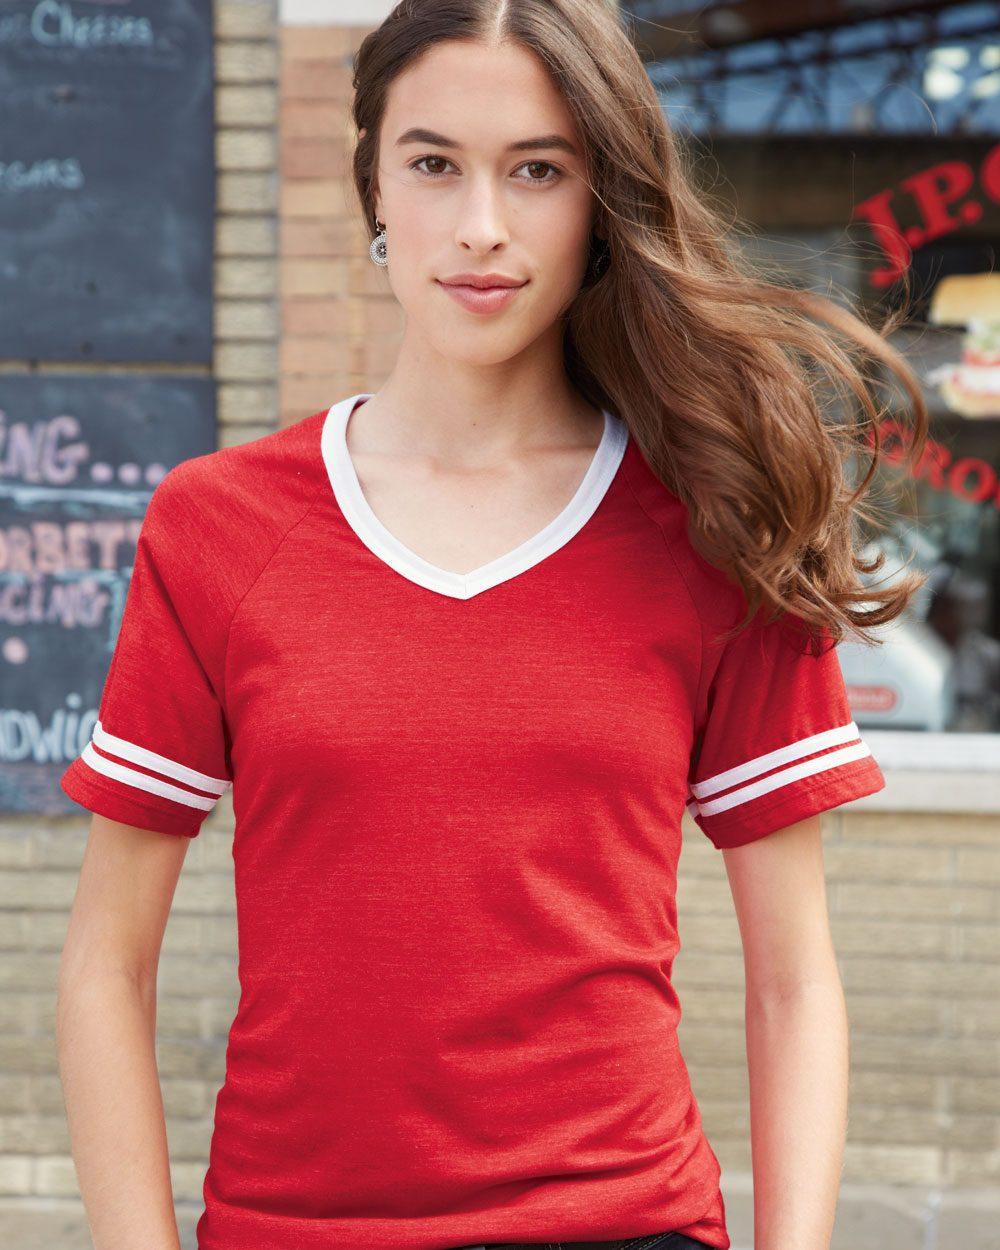 Blue 84 Juniors' Triblend V-Neck Ringer T-Shirt - JTVR